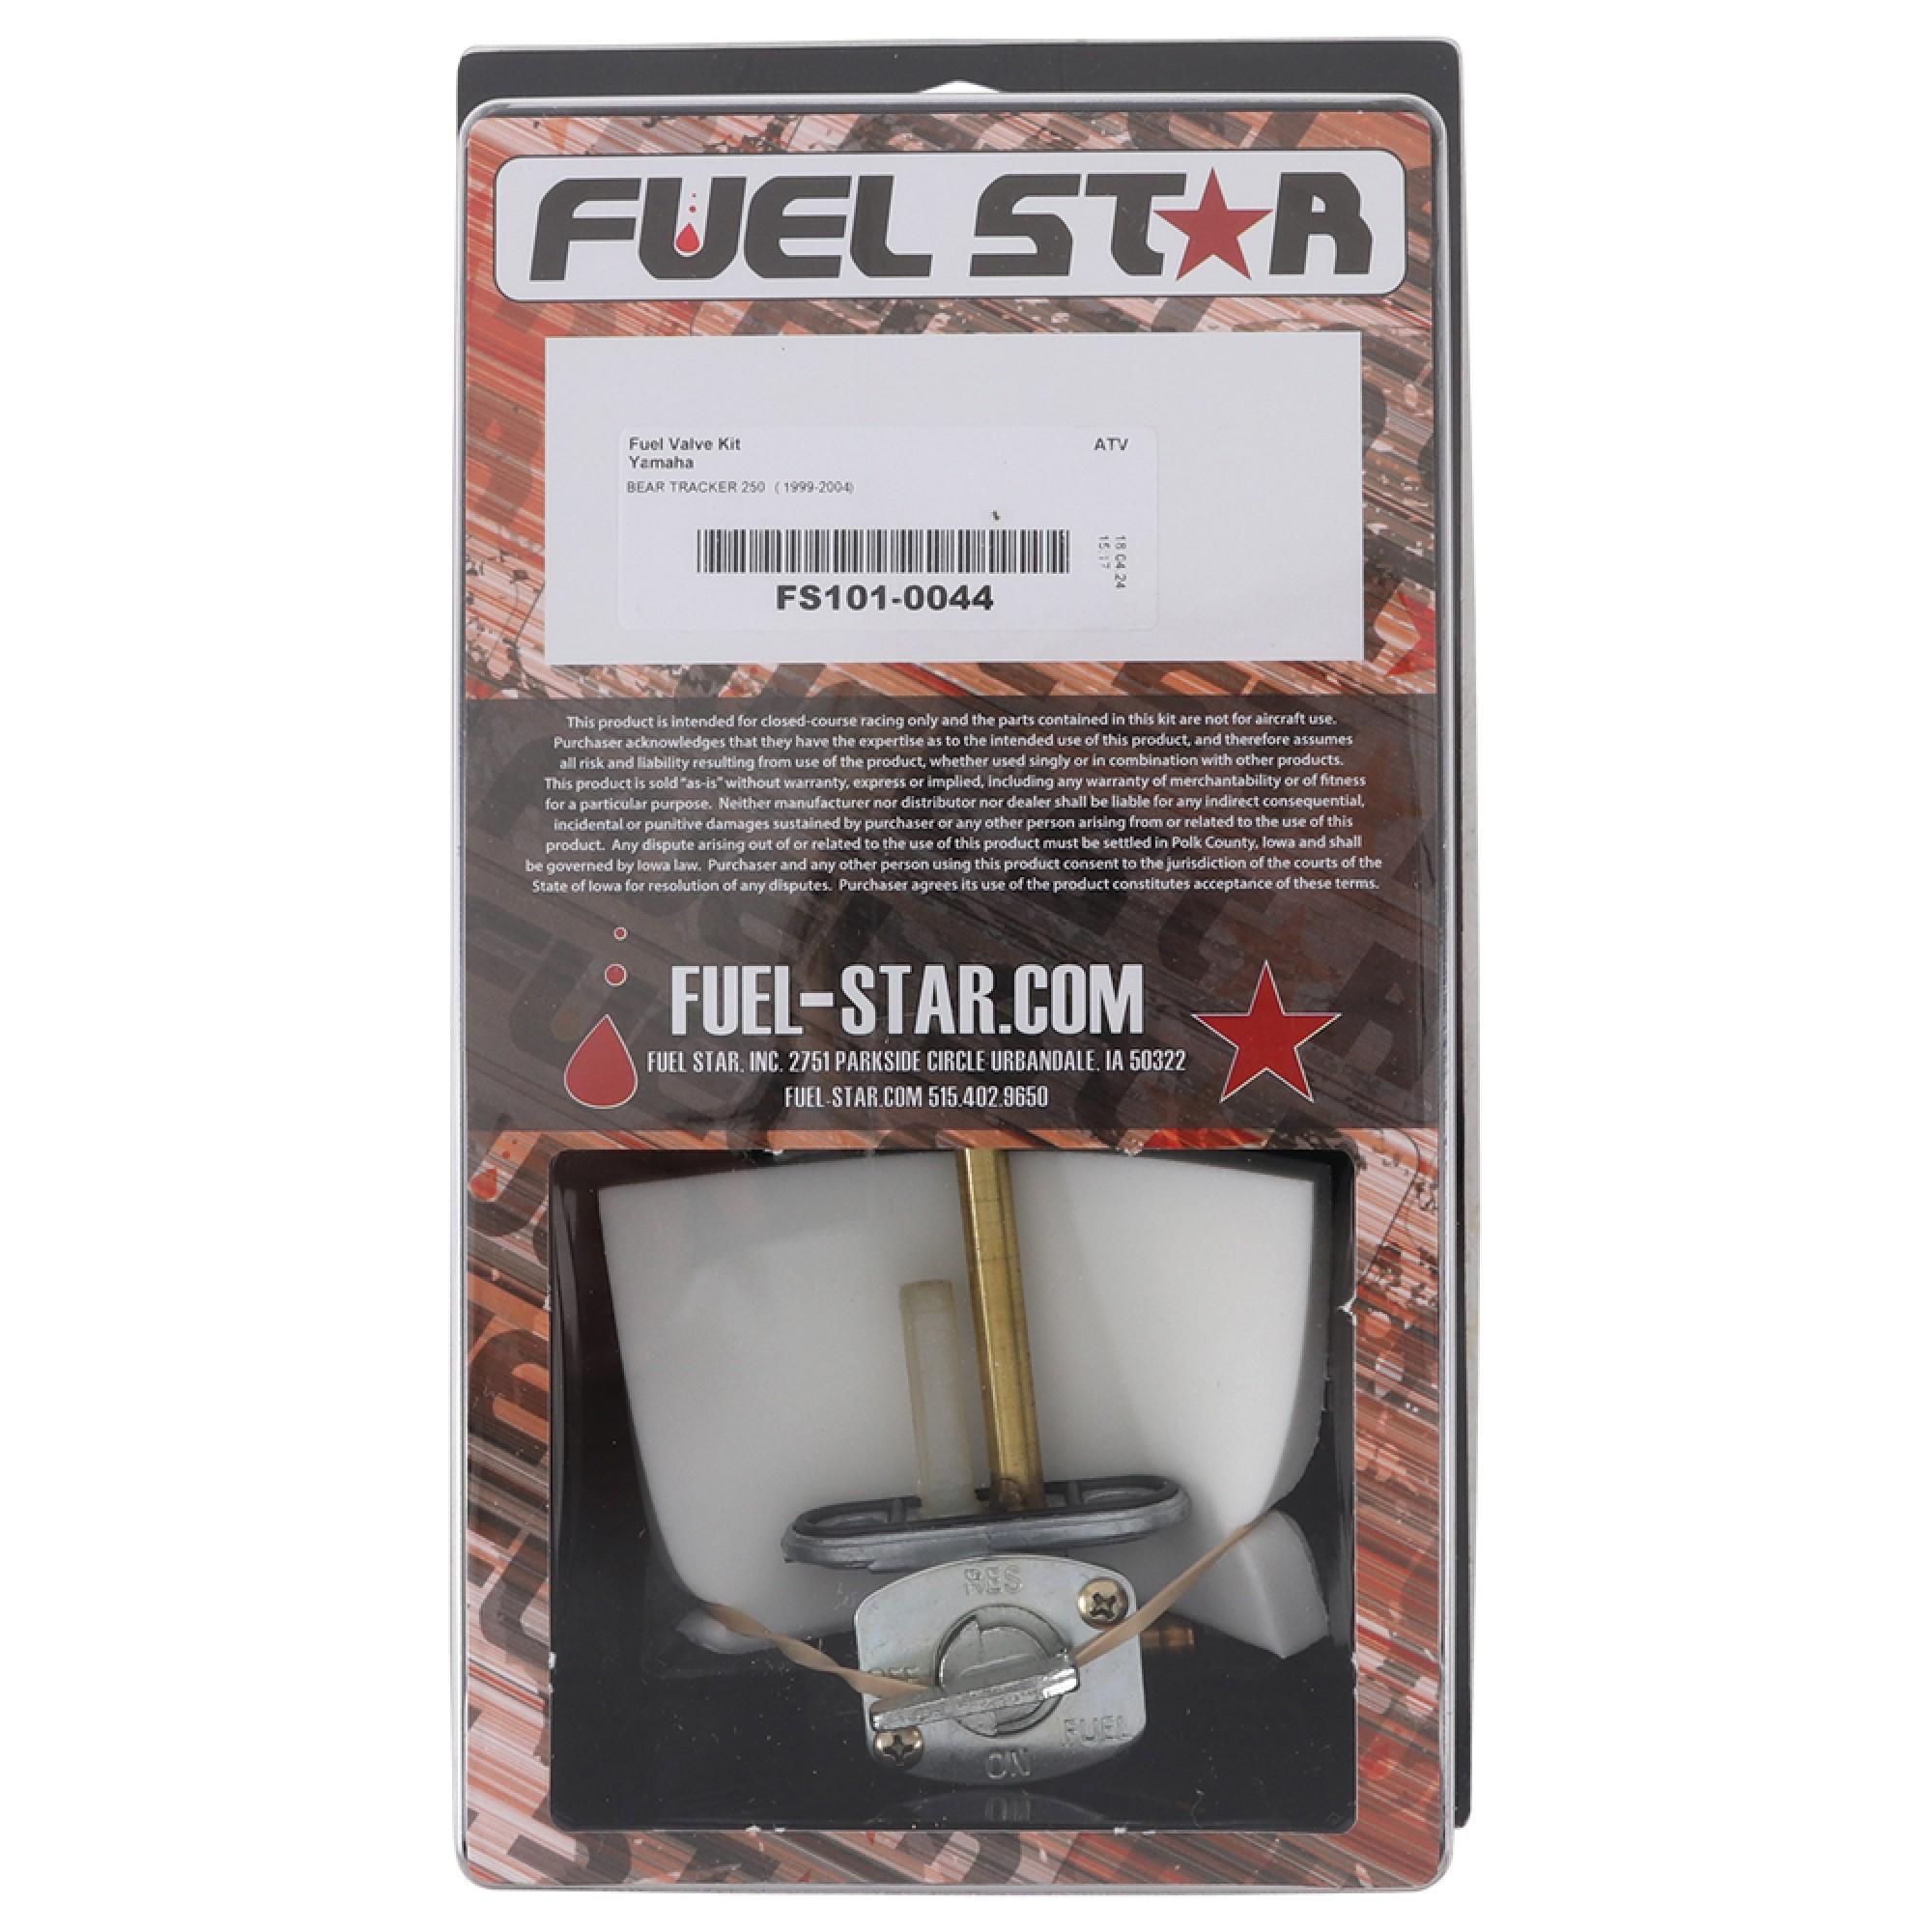 Fuel Star FS101-0038 Fuel Valve Kit